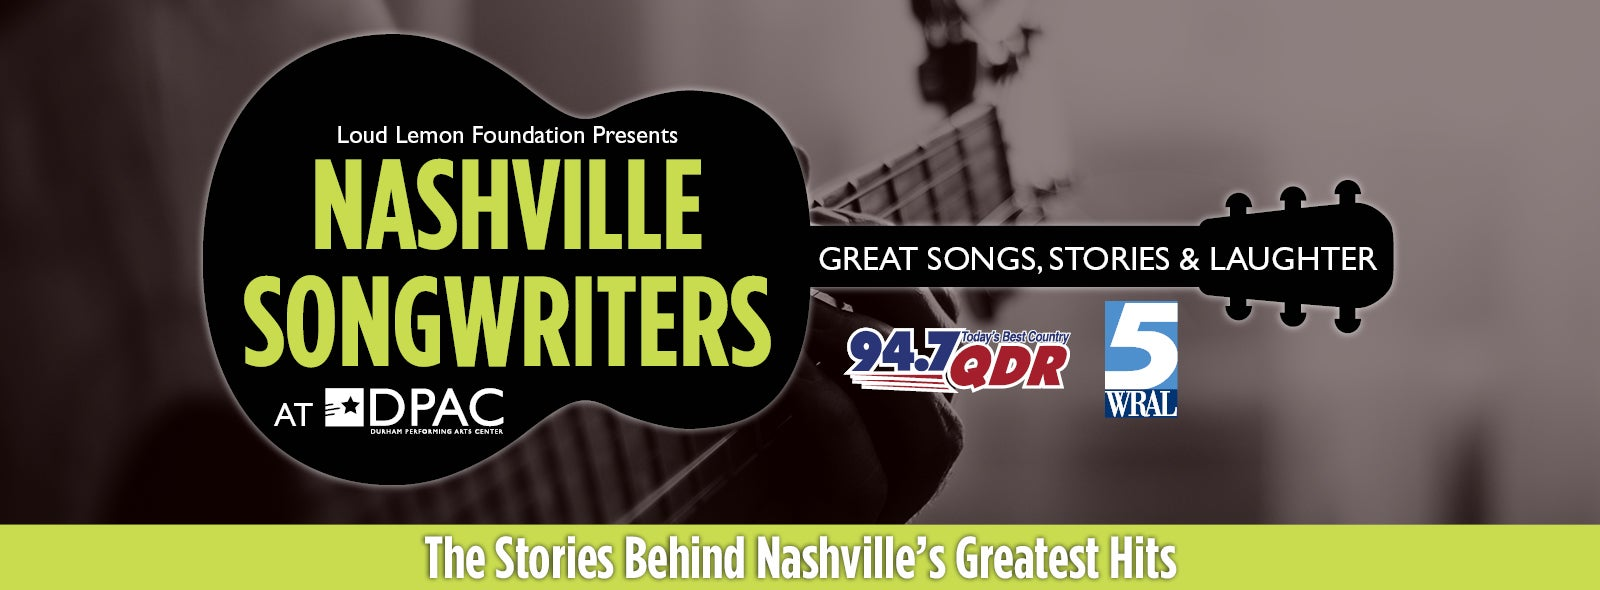 NashvilleSongwriters1600x5902.jpg